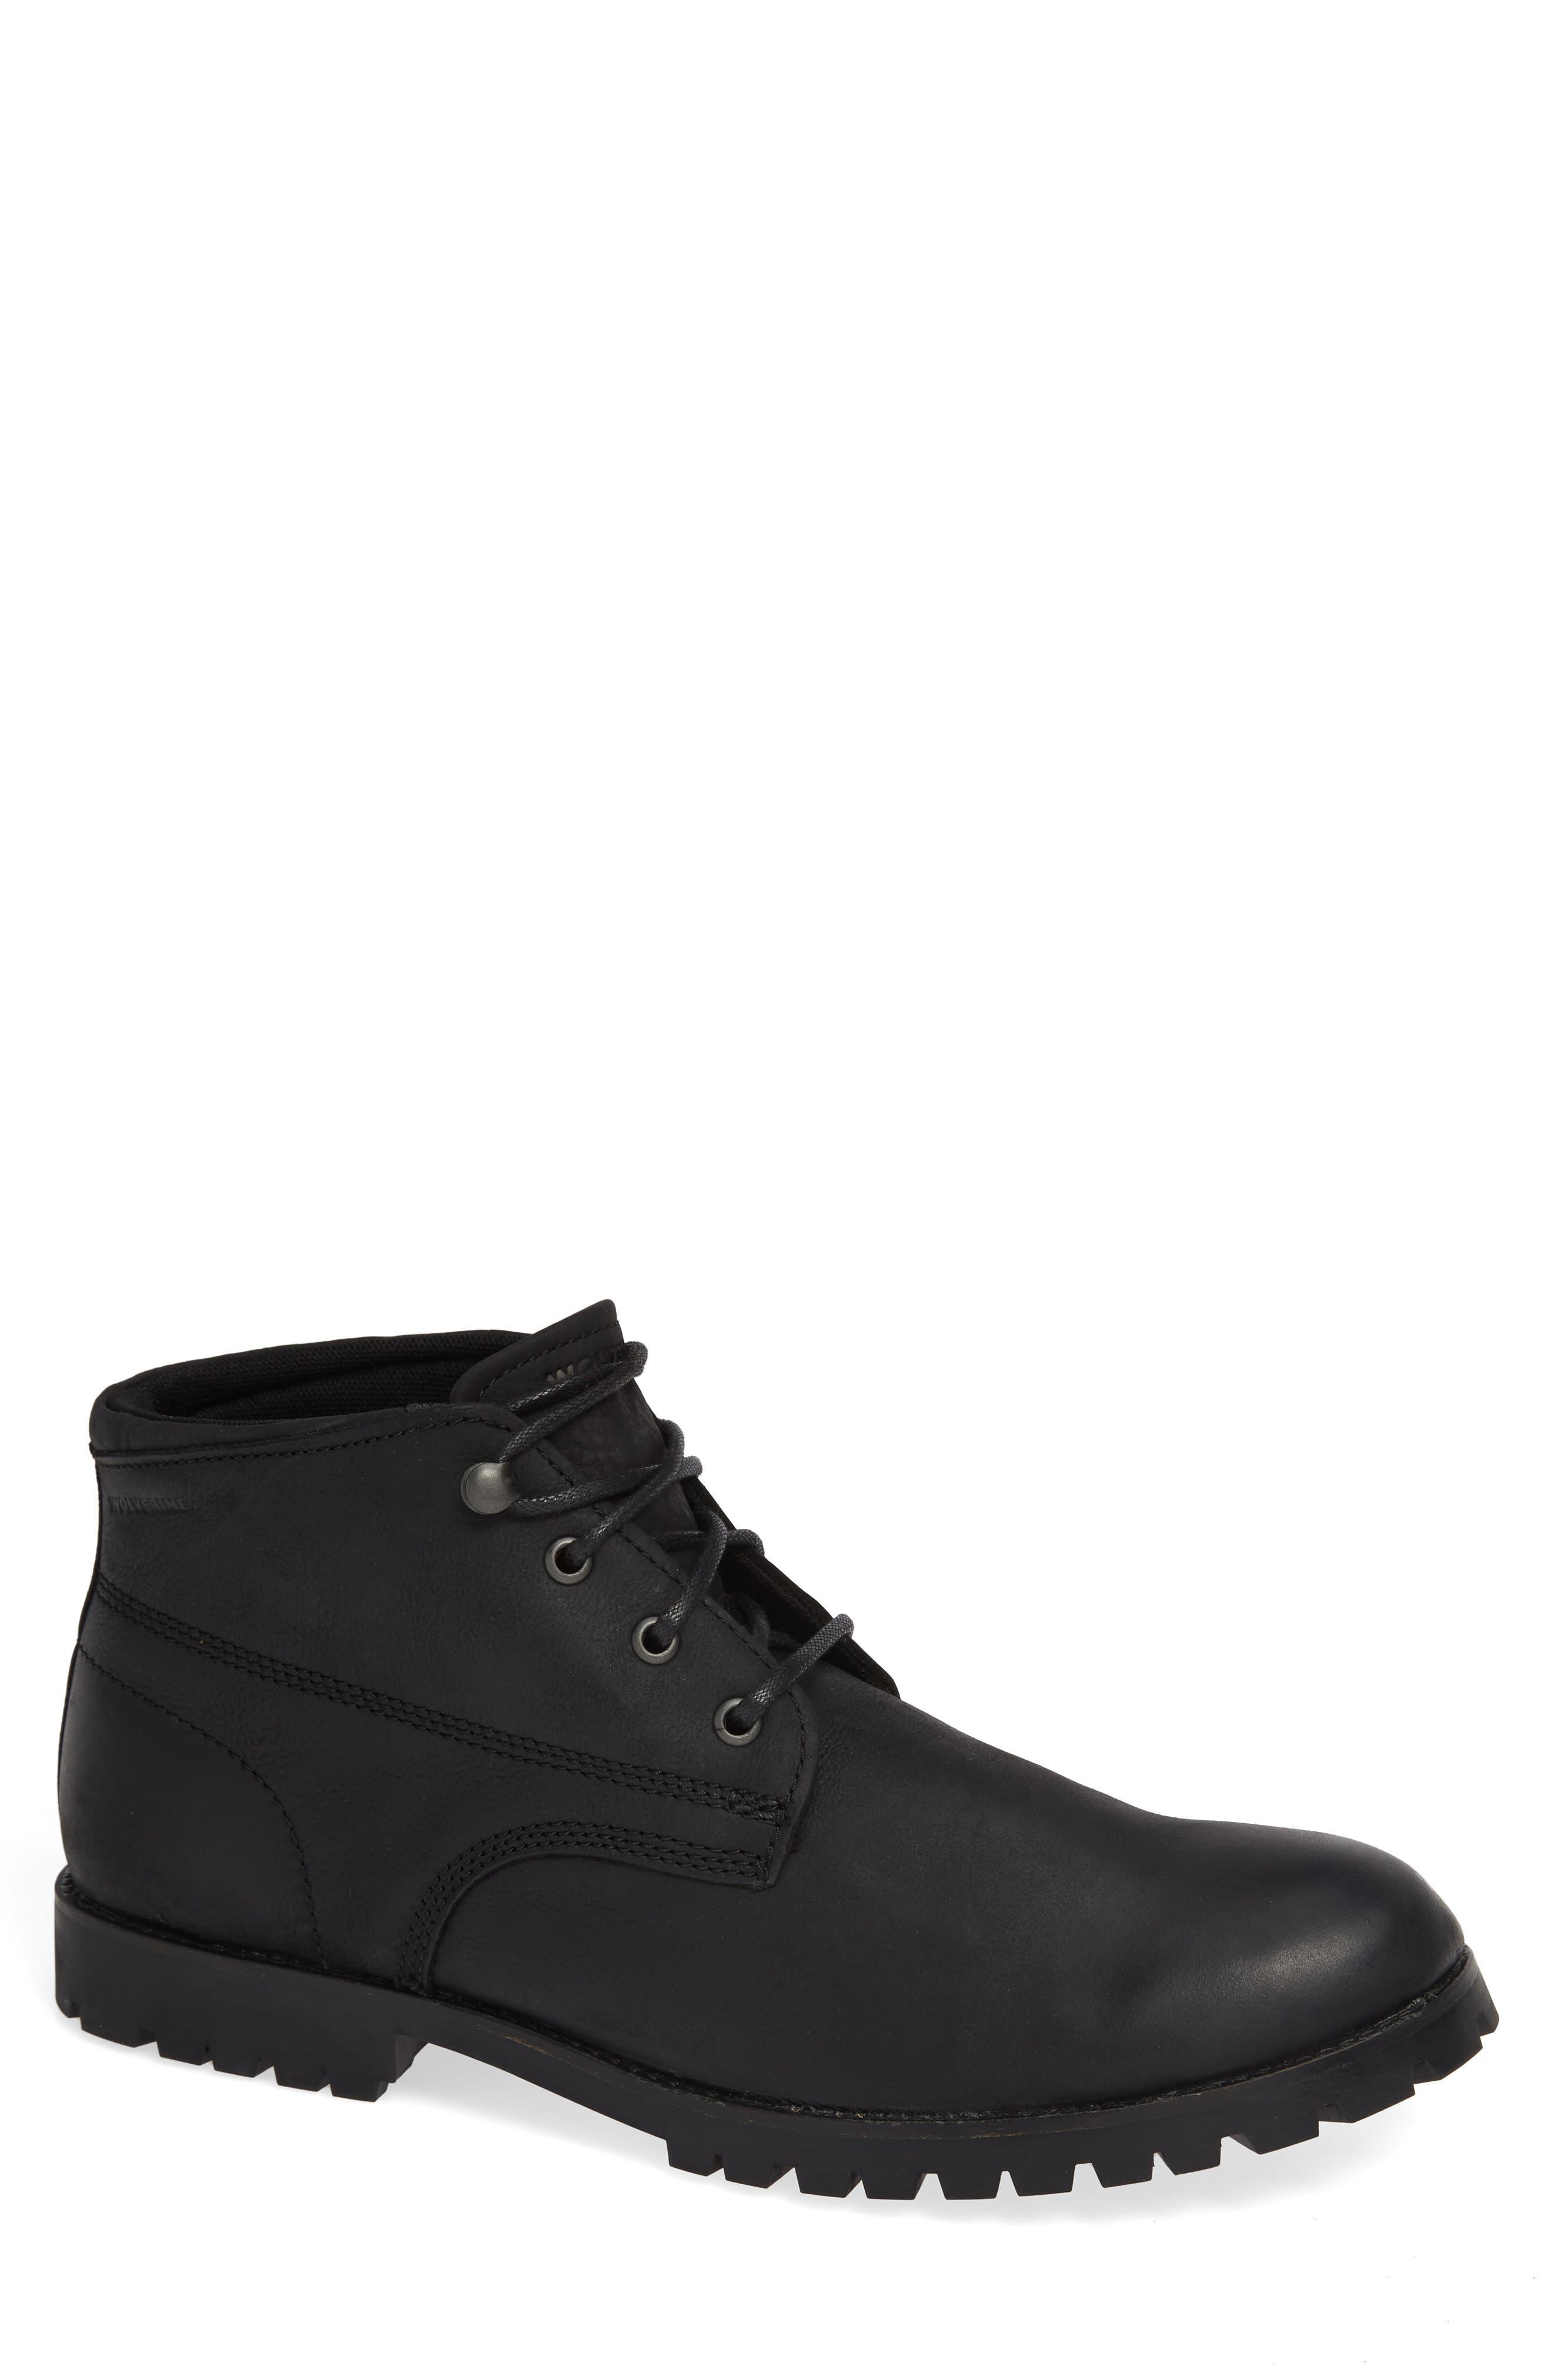 WOLVERINE Cort Plain Toe Waterproof Boot, Main, color, MEDIUM BLACK